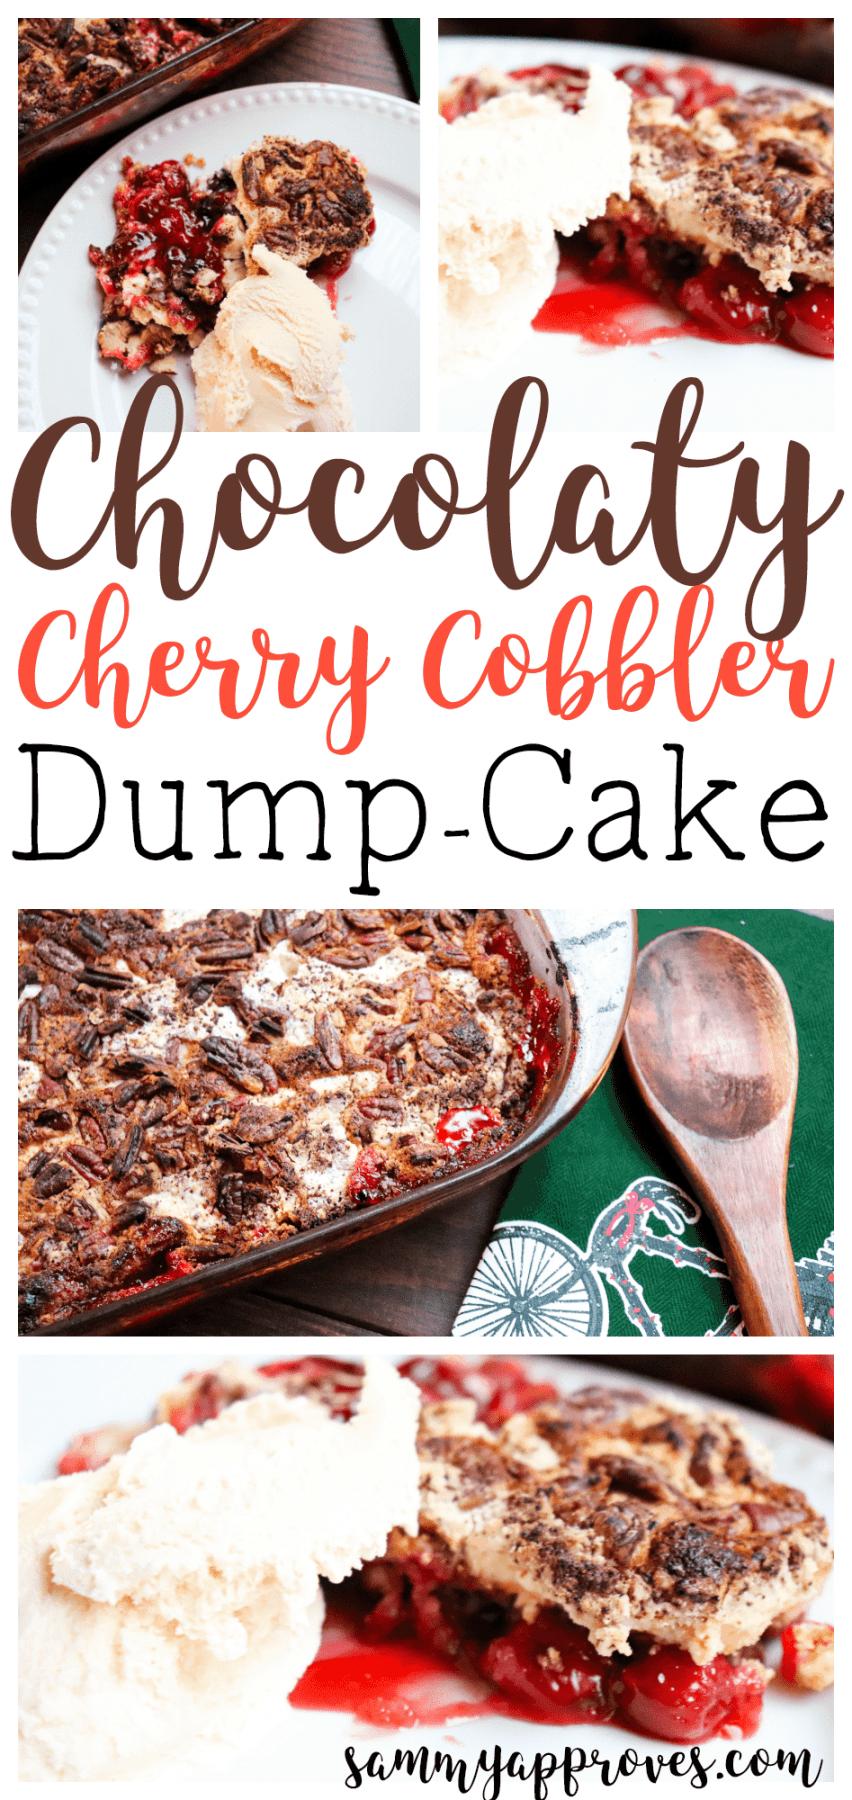 Chocolaty Cherry Cobbler Dump Cake